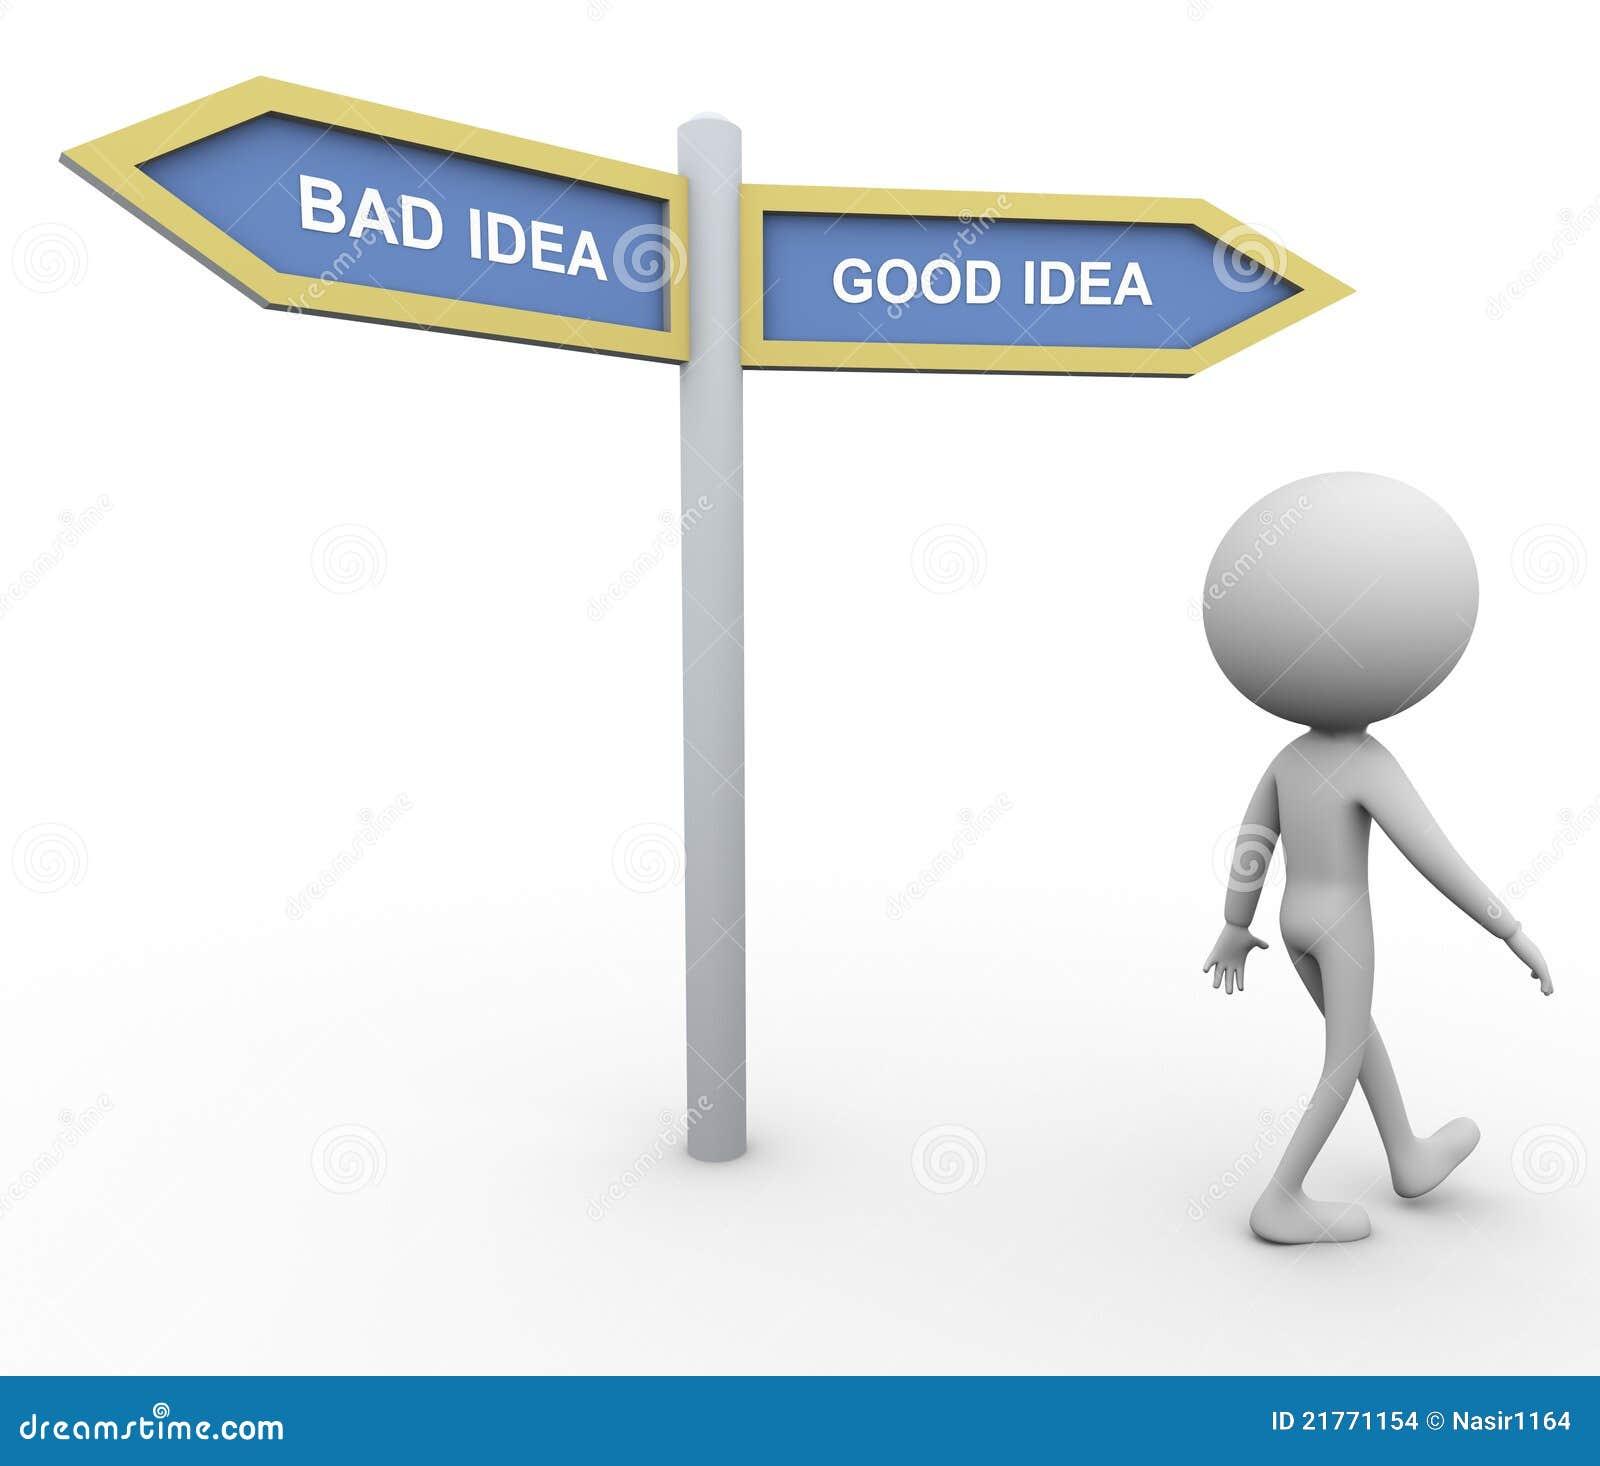 Bad idea good idea stock images image 21771154 for Bad idee